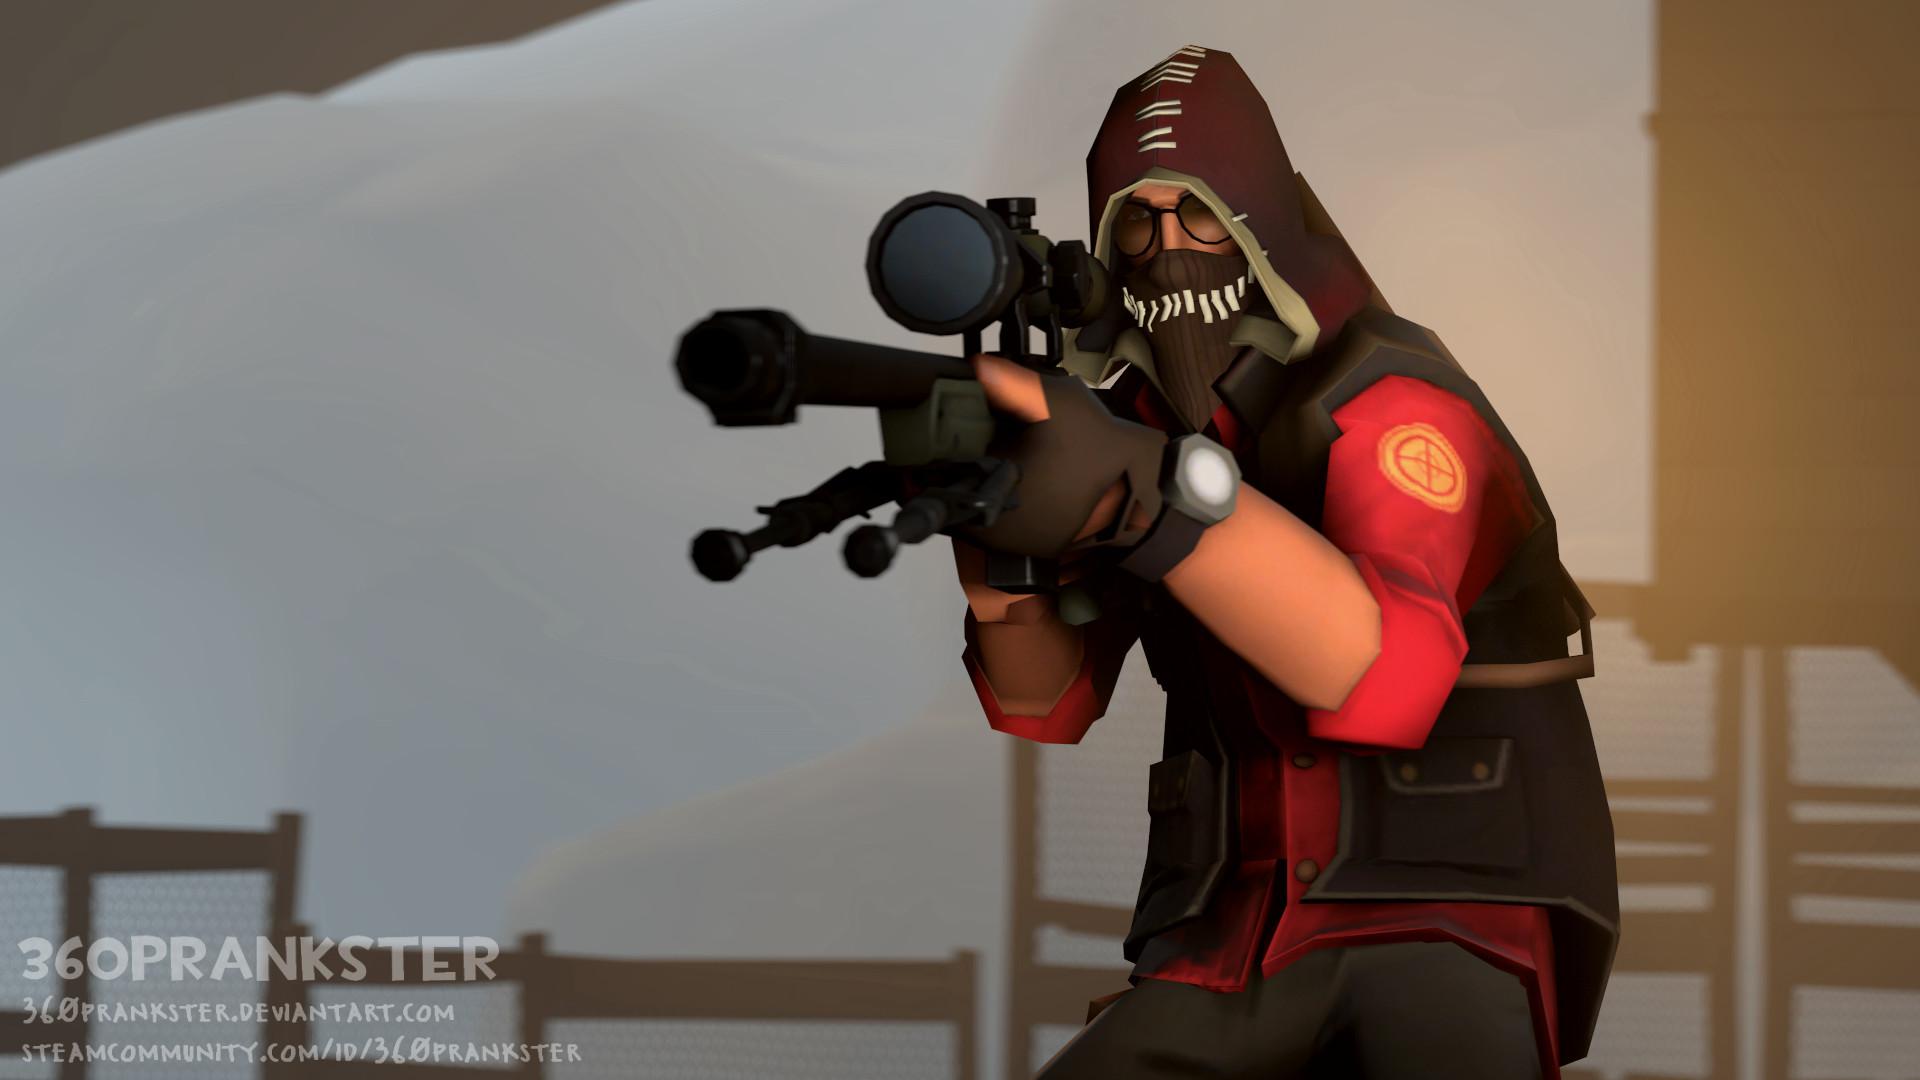 Res: 1920x1080, SFM] TF2 Loadout Sniper 360PraNKsTer by 360PraNKsTer on